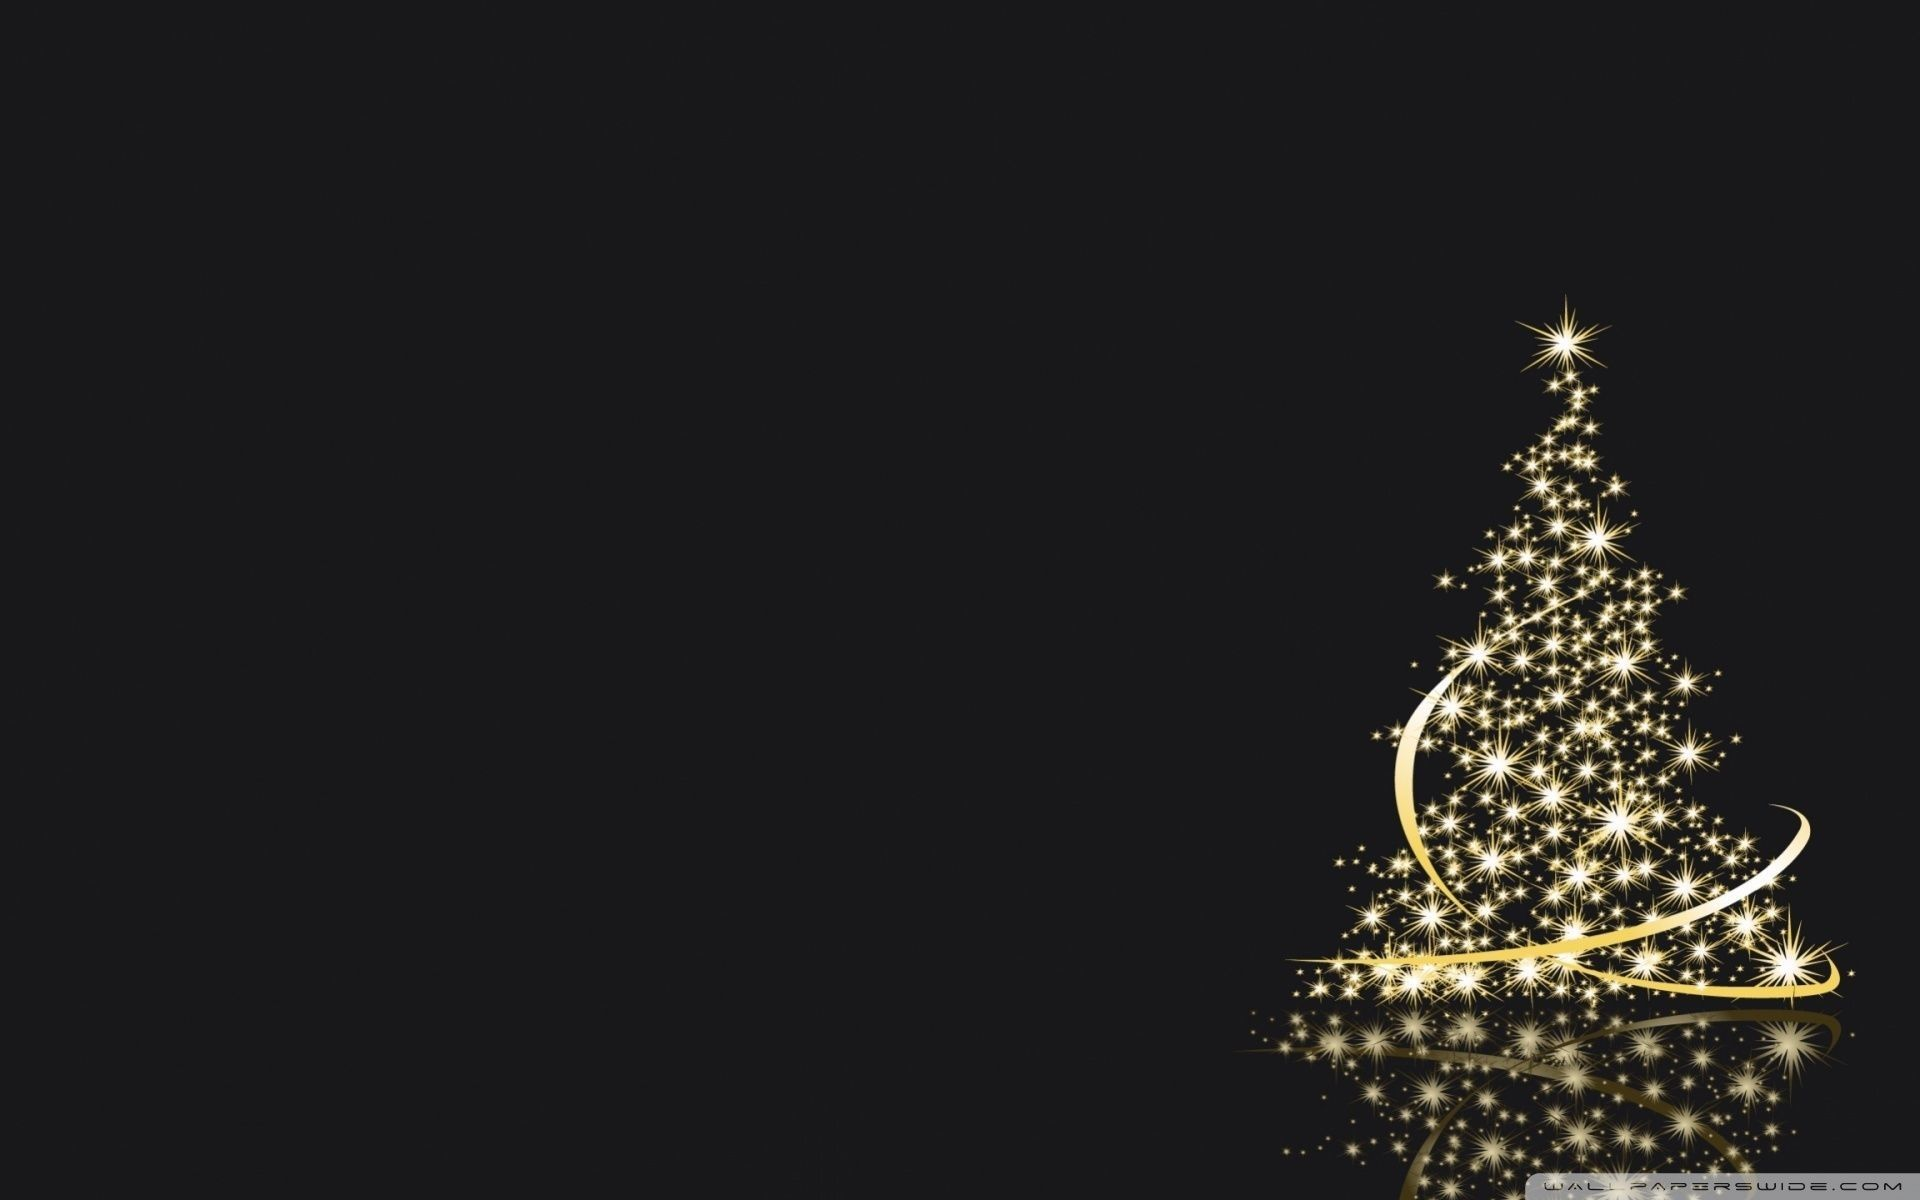 Christmas Aesthetic Wallpapers Top Free Christmas Christmas Aesthetic Wallpapers Top Free Chris In 2020 Christmas Wallpaper Free Christmas Wallpaper Christmas Desktop